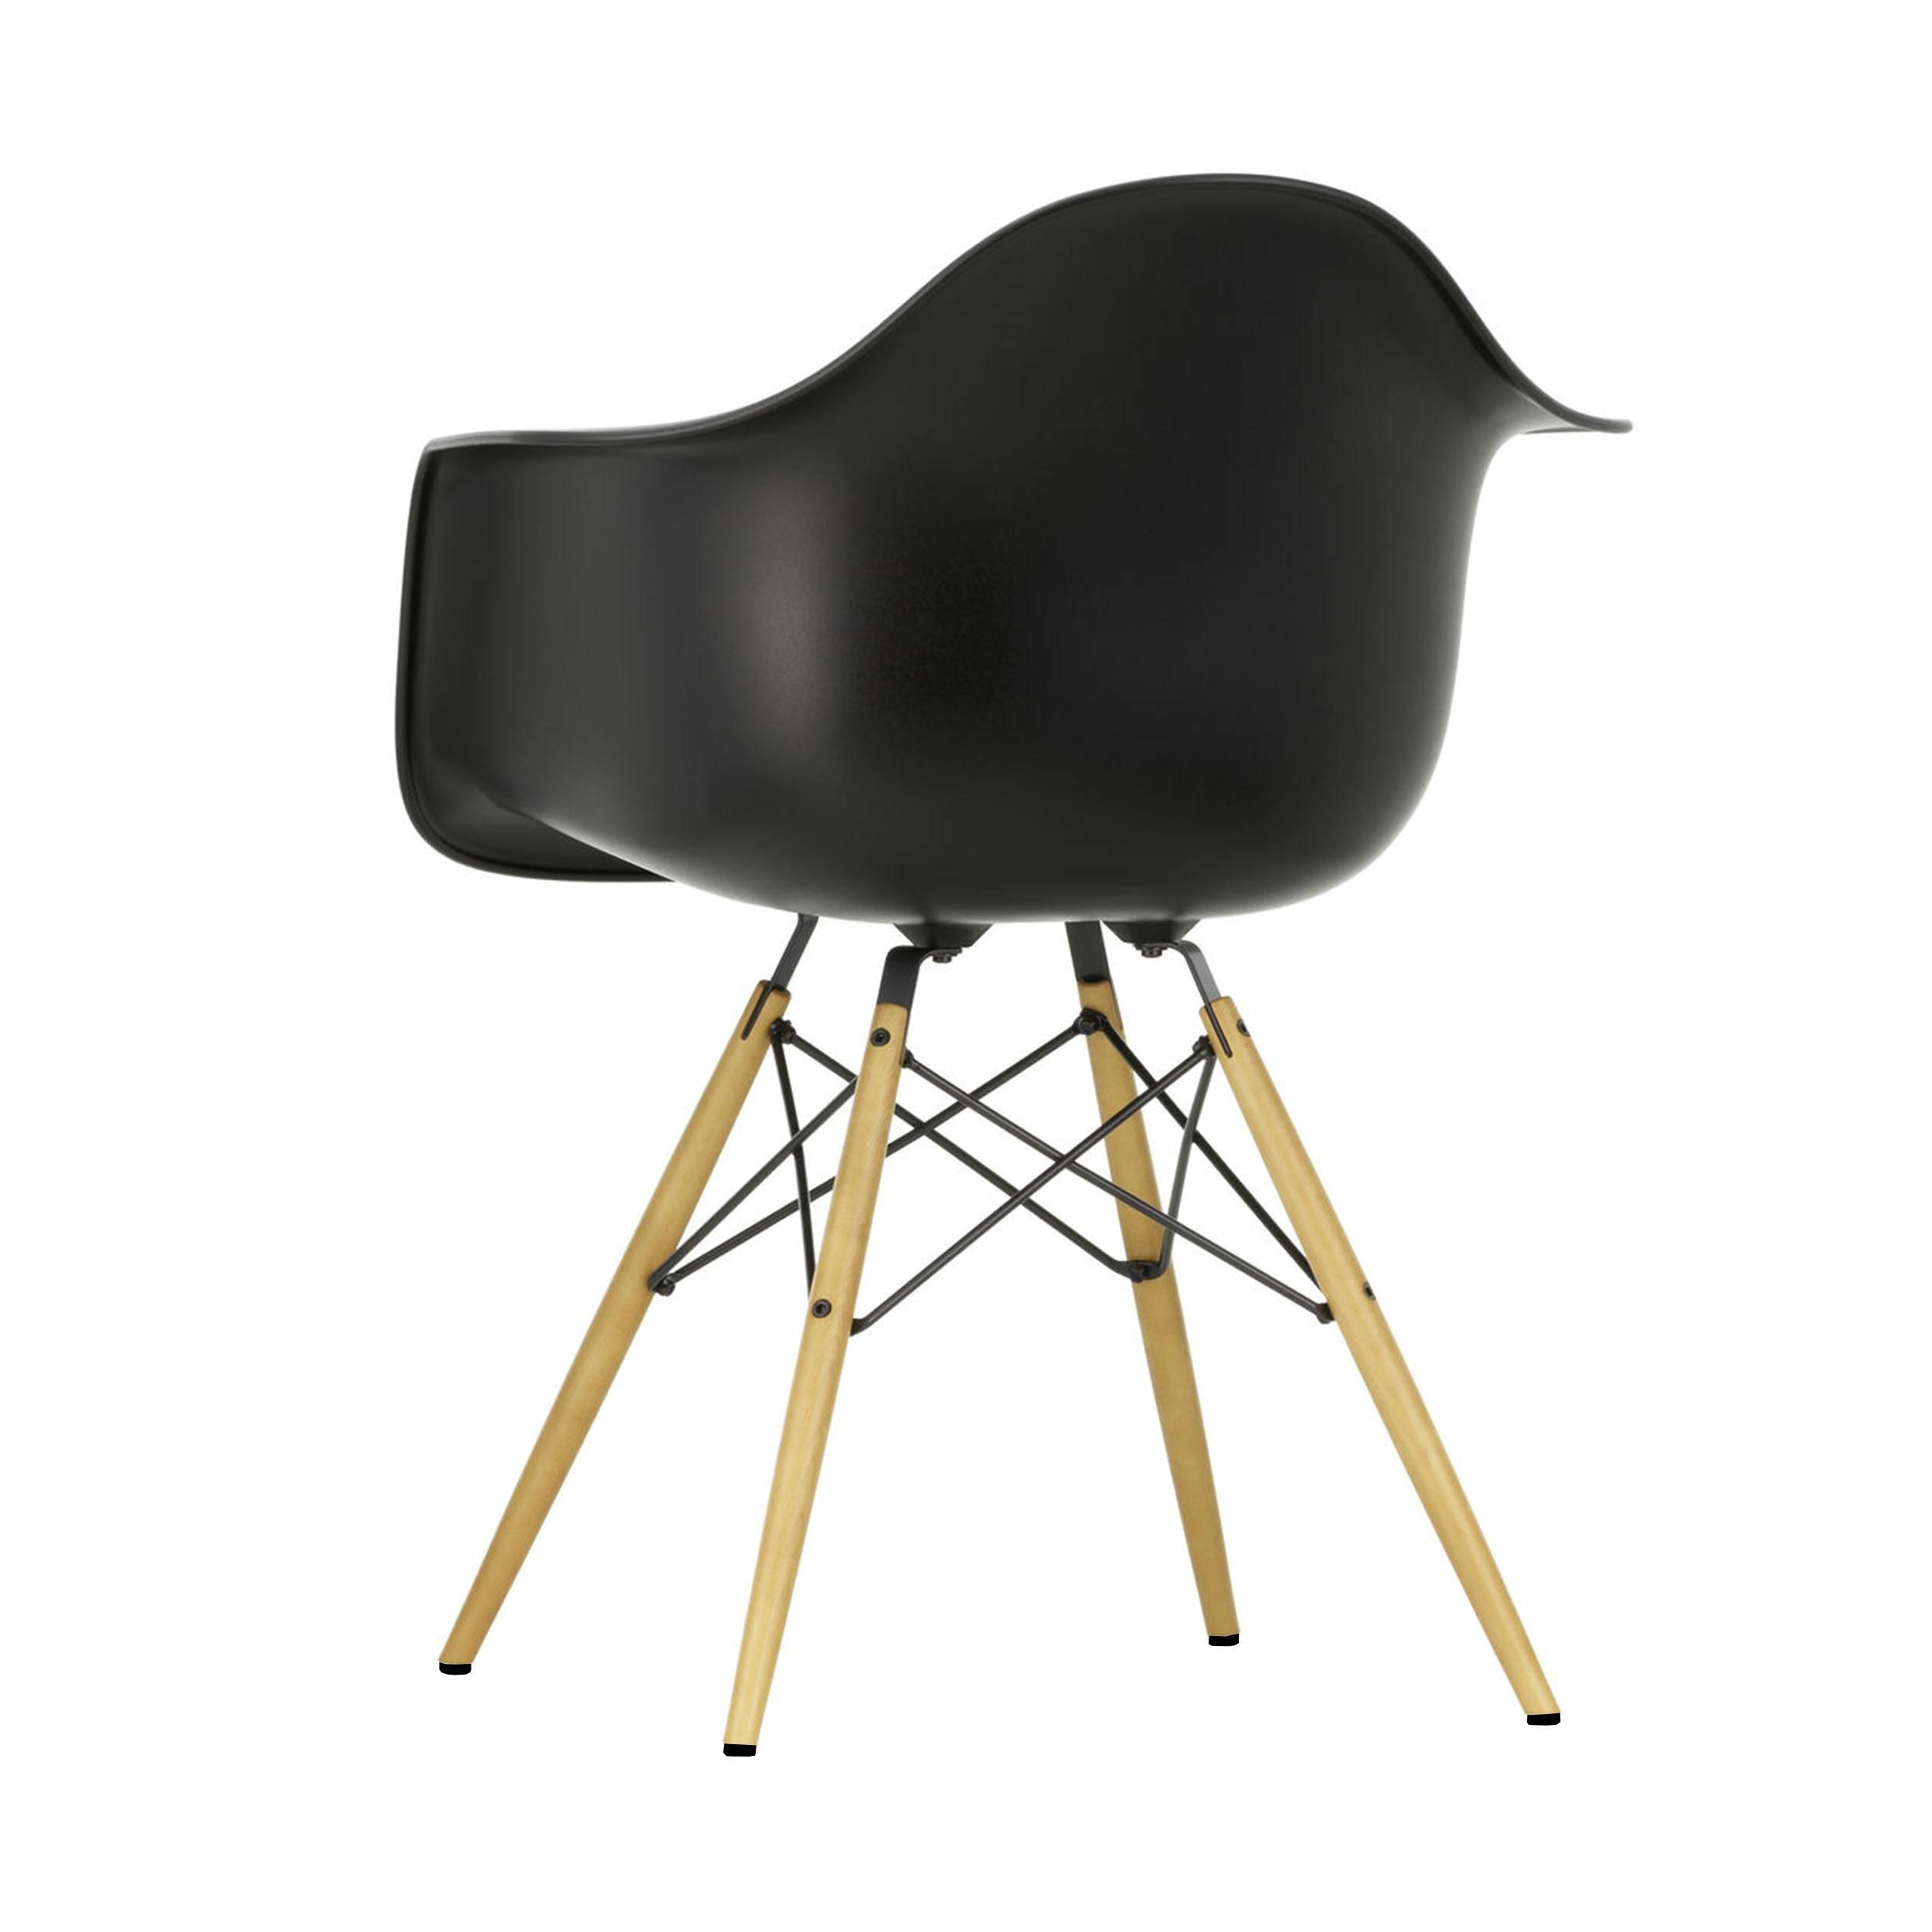 Eames Plastic Armchair Stuhl DAW mit Filzgleitern